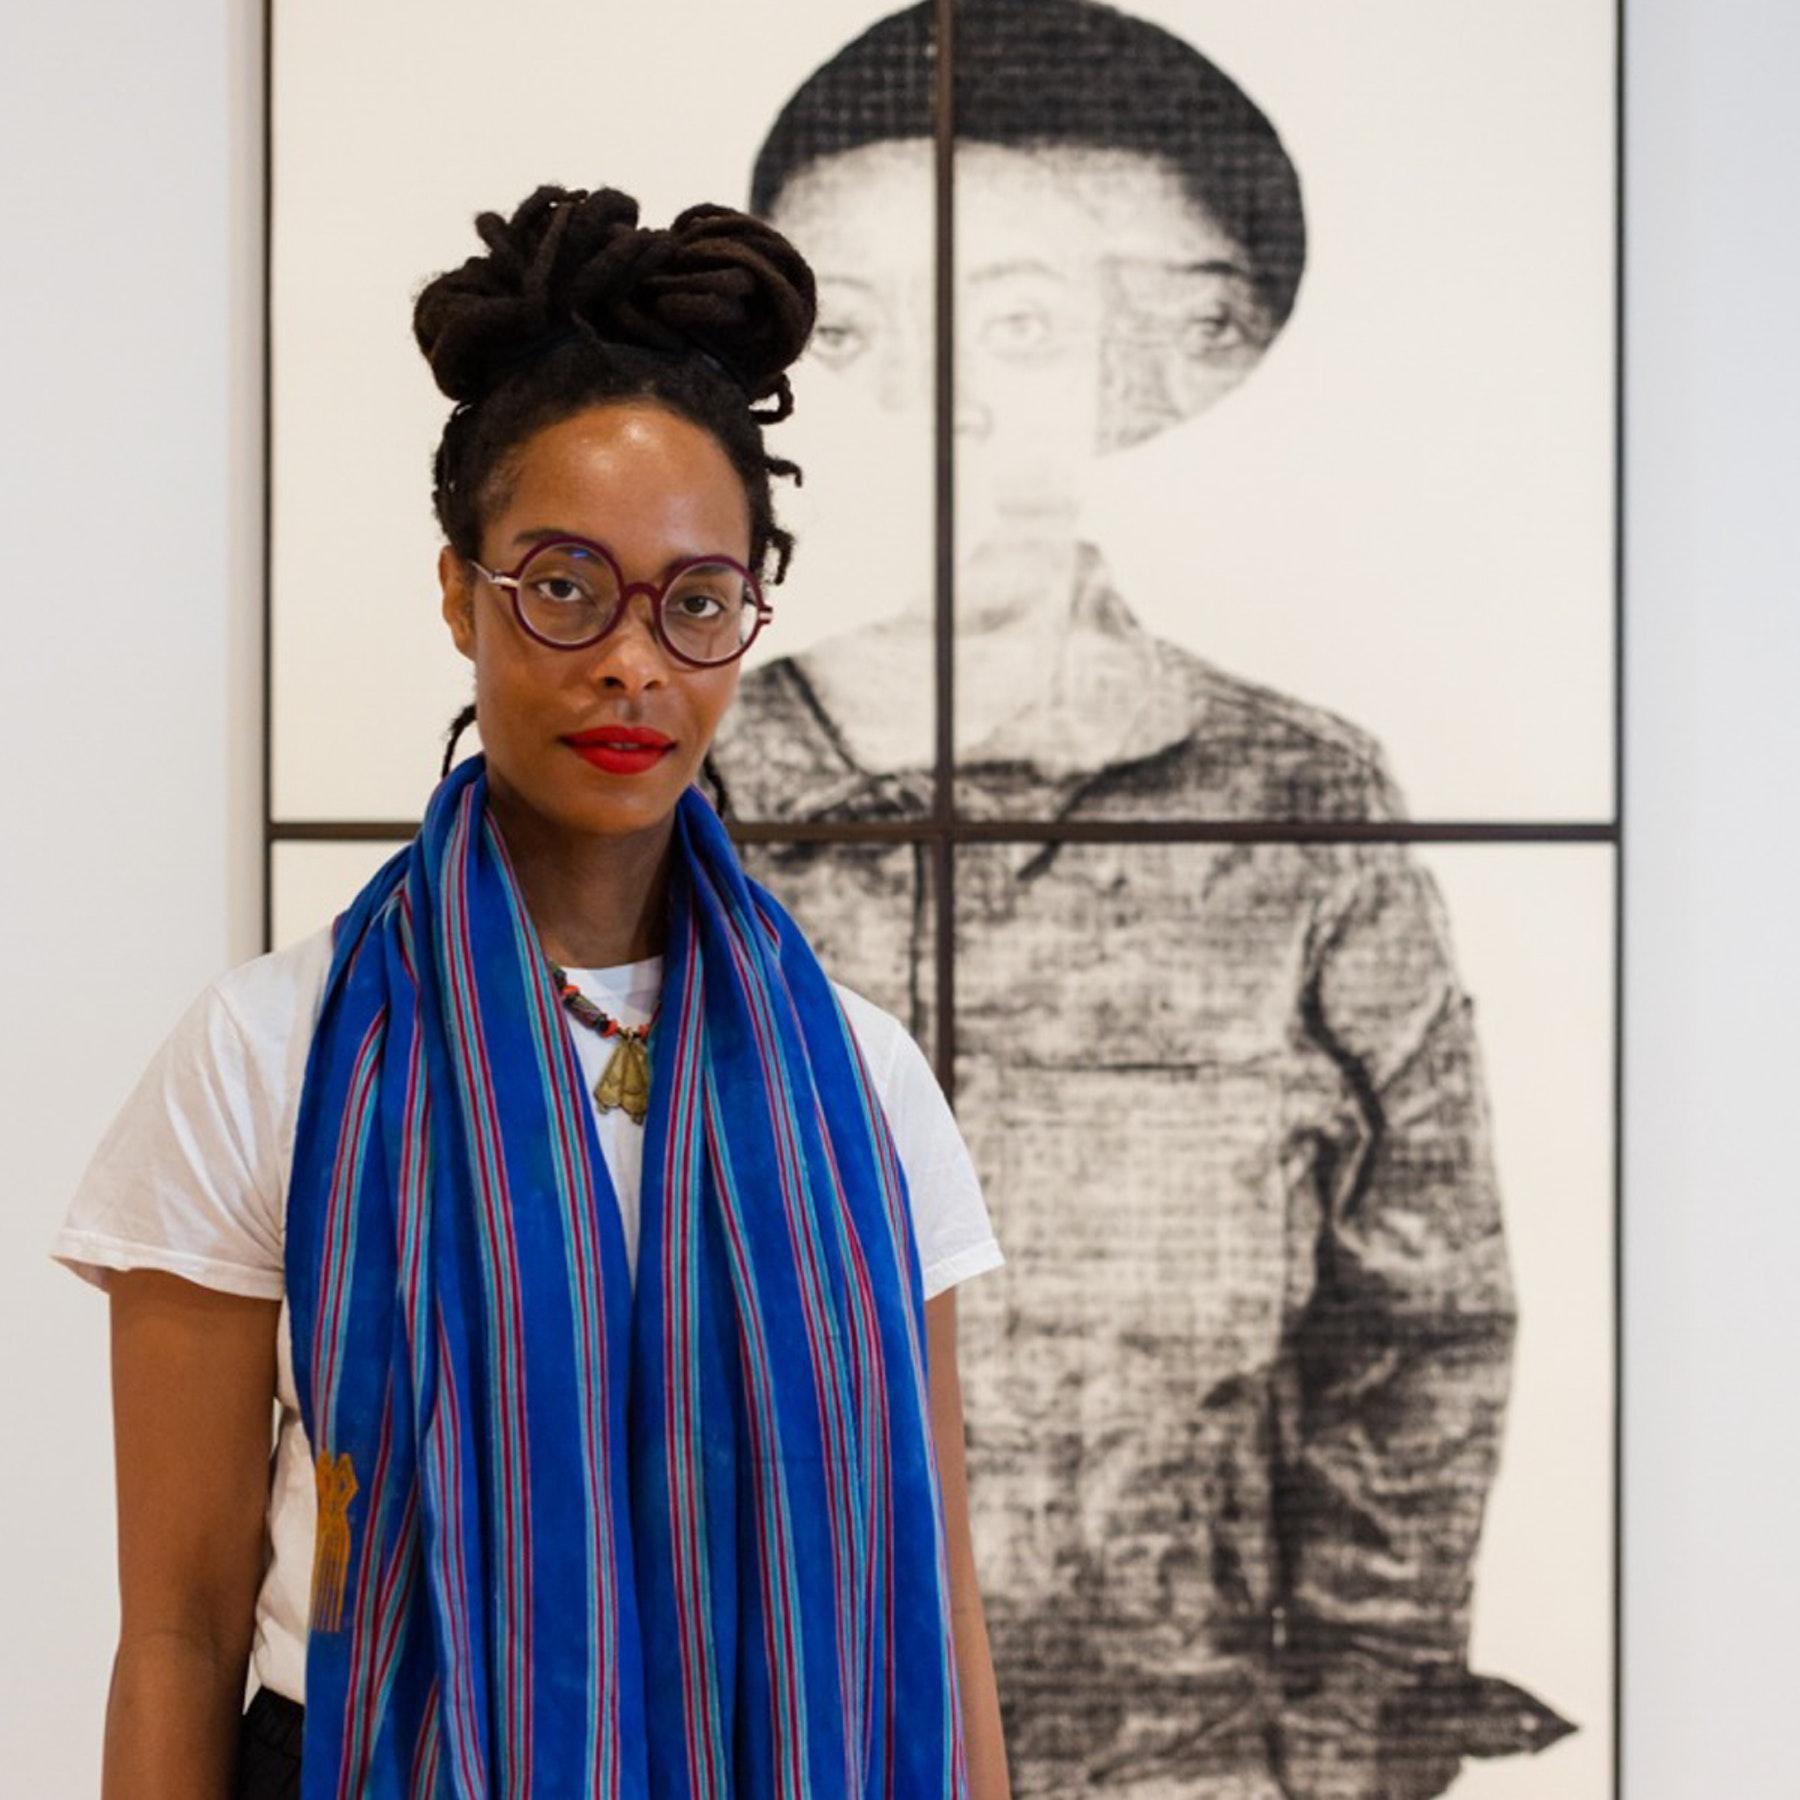 Artist Kenturah Davis in front of her work at the California African American Museum in Los Angeles, California. Photo by HRDWRKR.